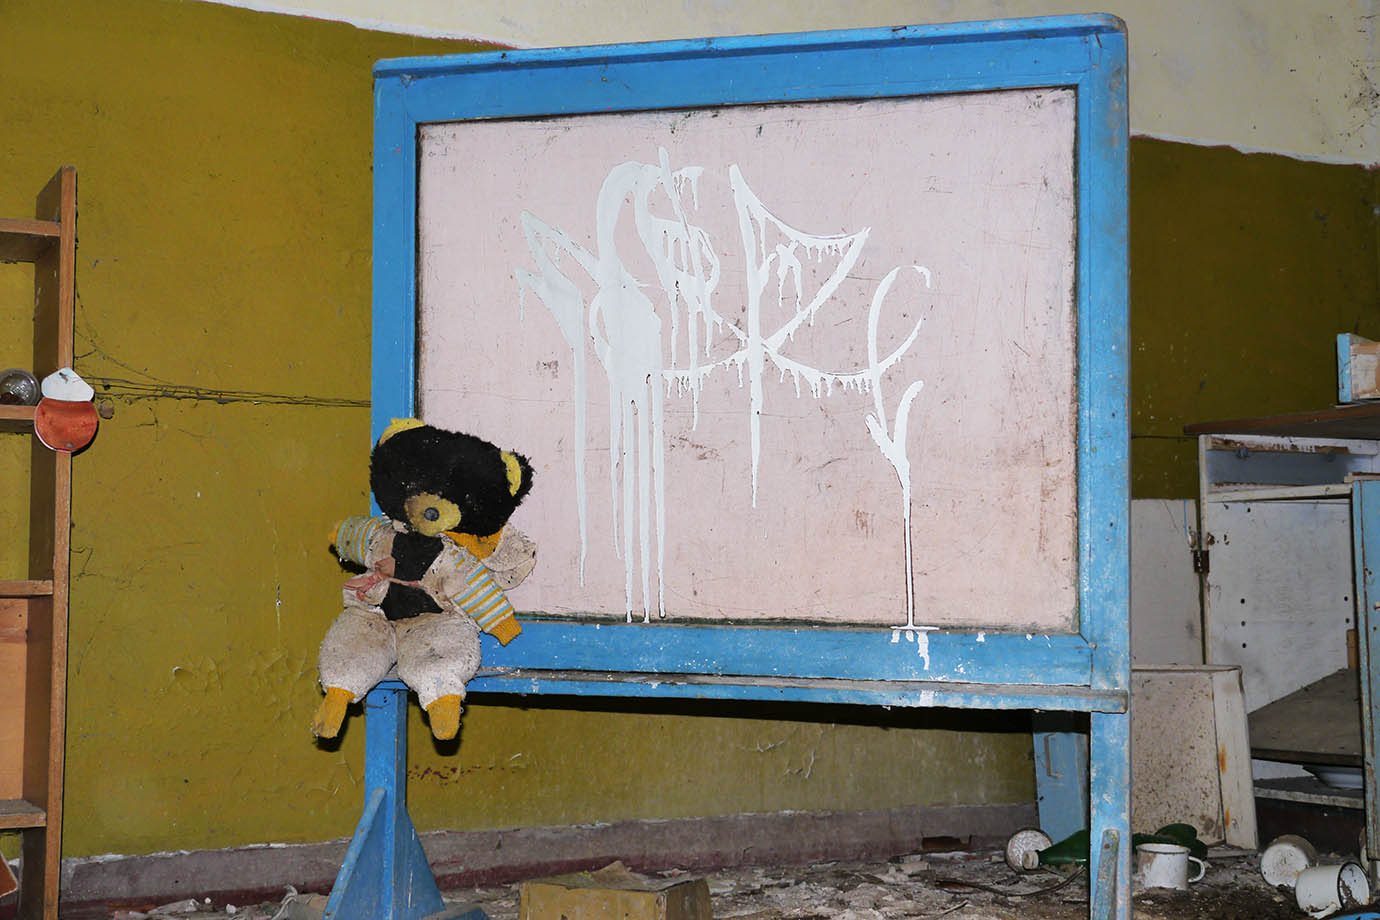 chernobyl-disaster25